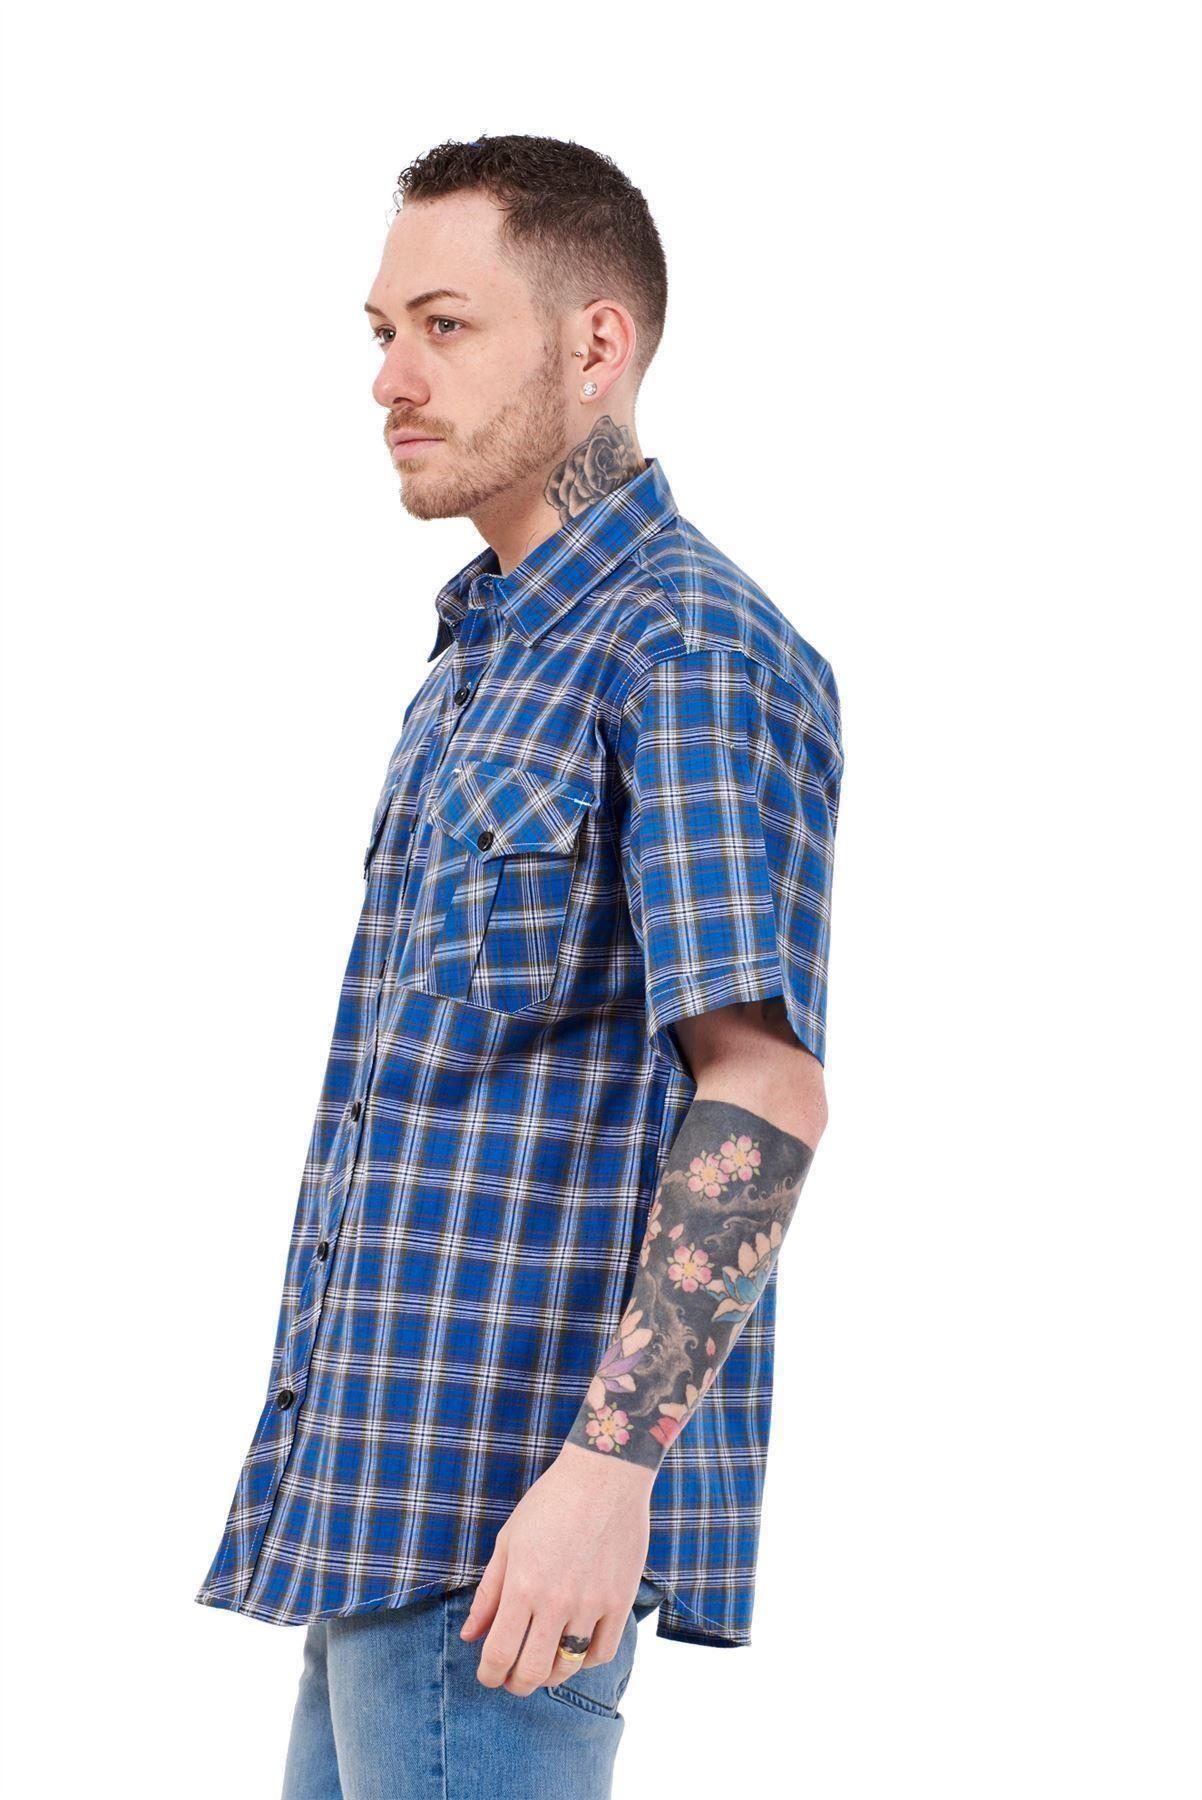 Mens-Regular-Big-Size-Shirts-Checked-Cotton-Blend-Casual-Short-Sleeve-Blue-M-5XL thumbnail 25